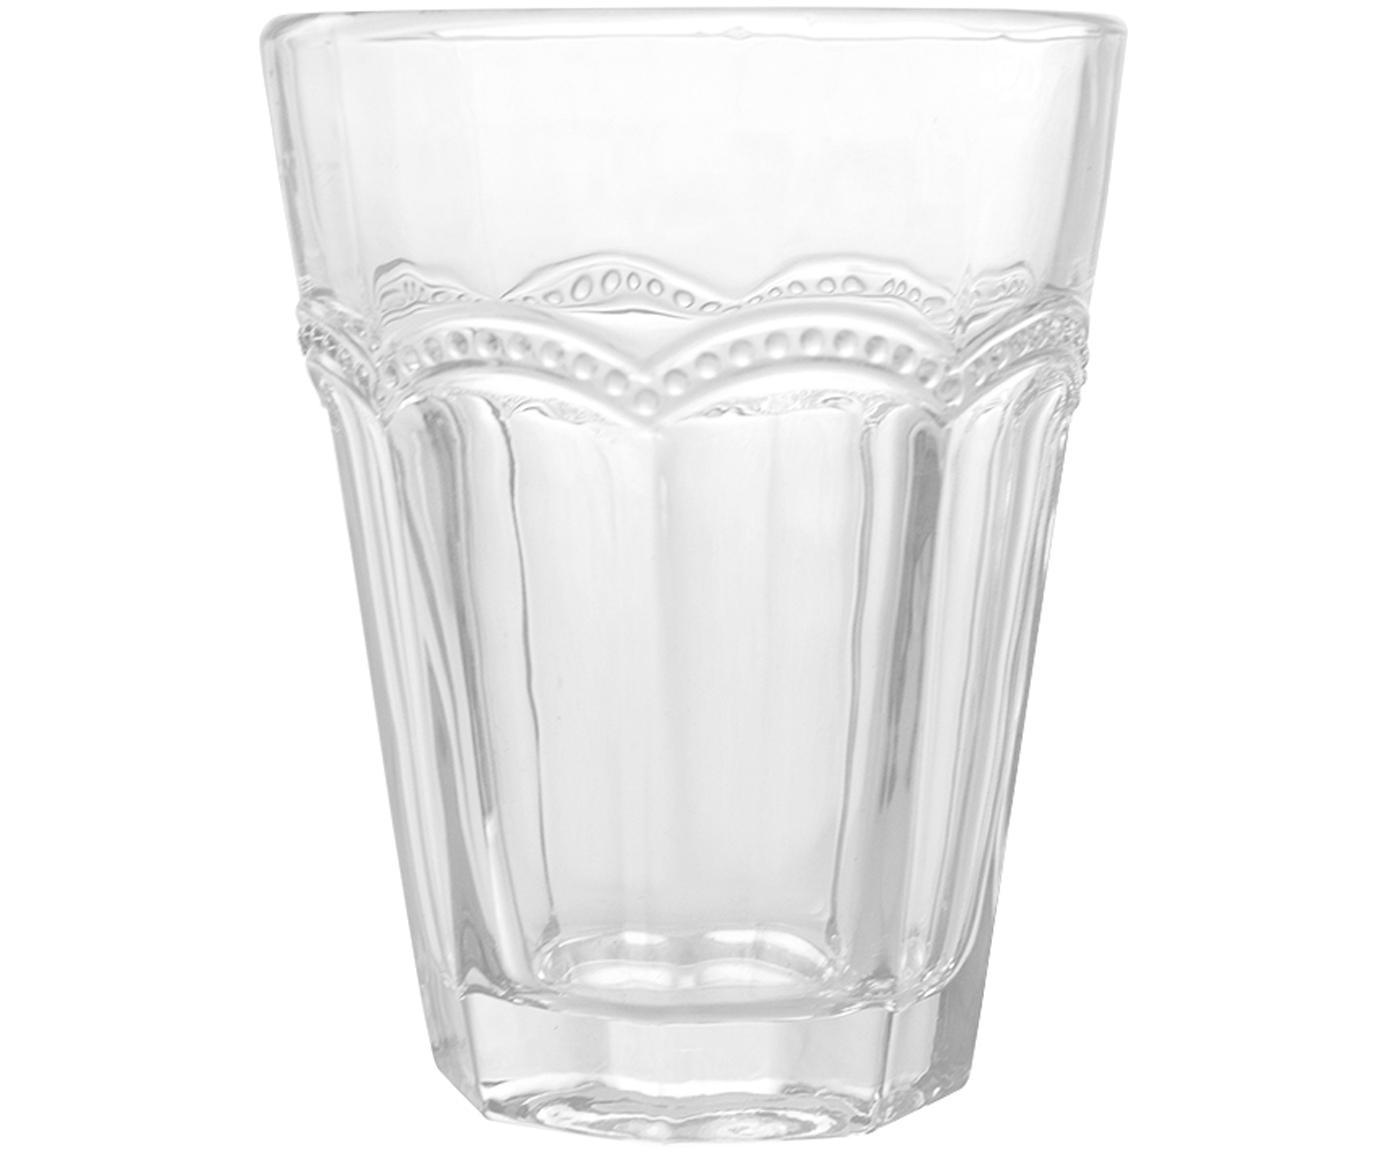 Vasos con relieve Floyd, 6uds., Vidrio, Transparente, Ø 9 x Al 11 cm